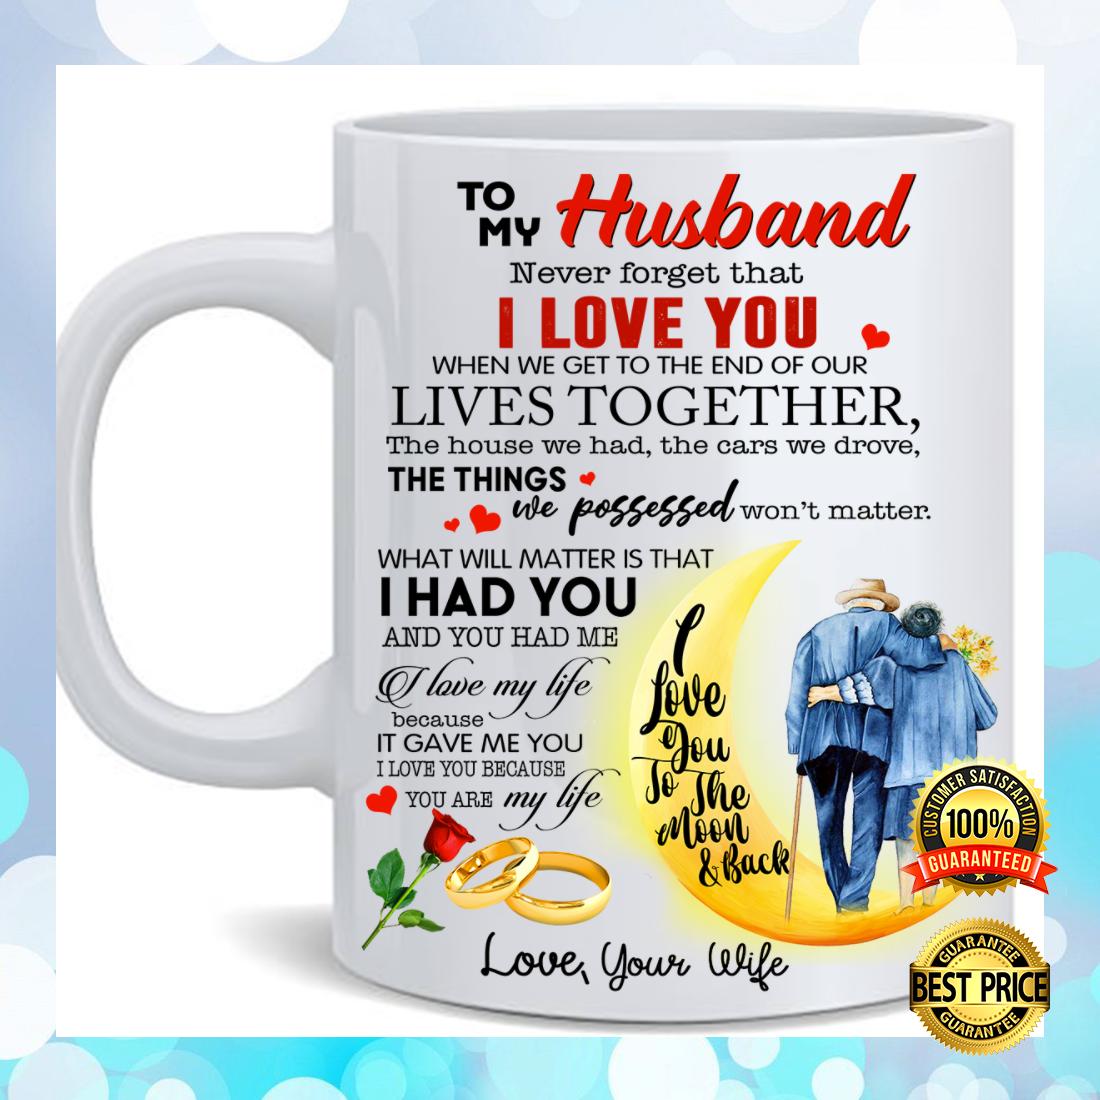 To my husband never forget that i love you mug 4